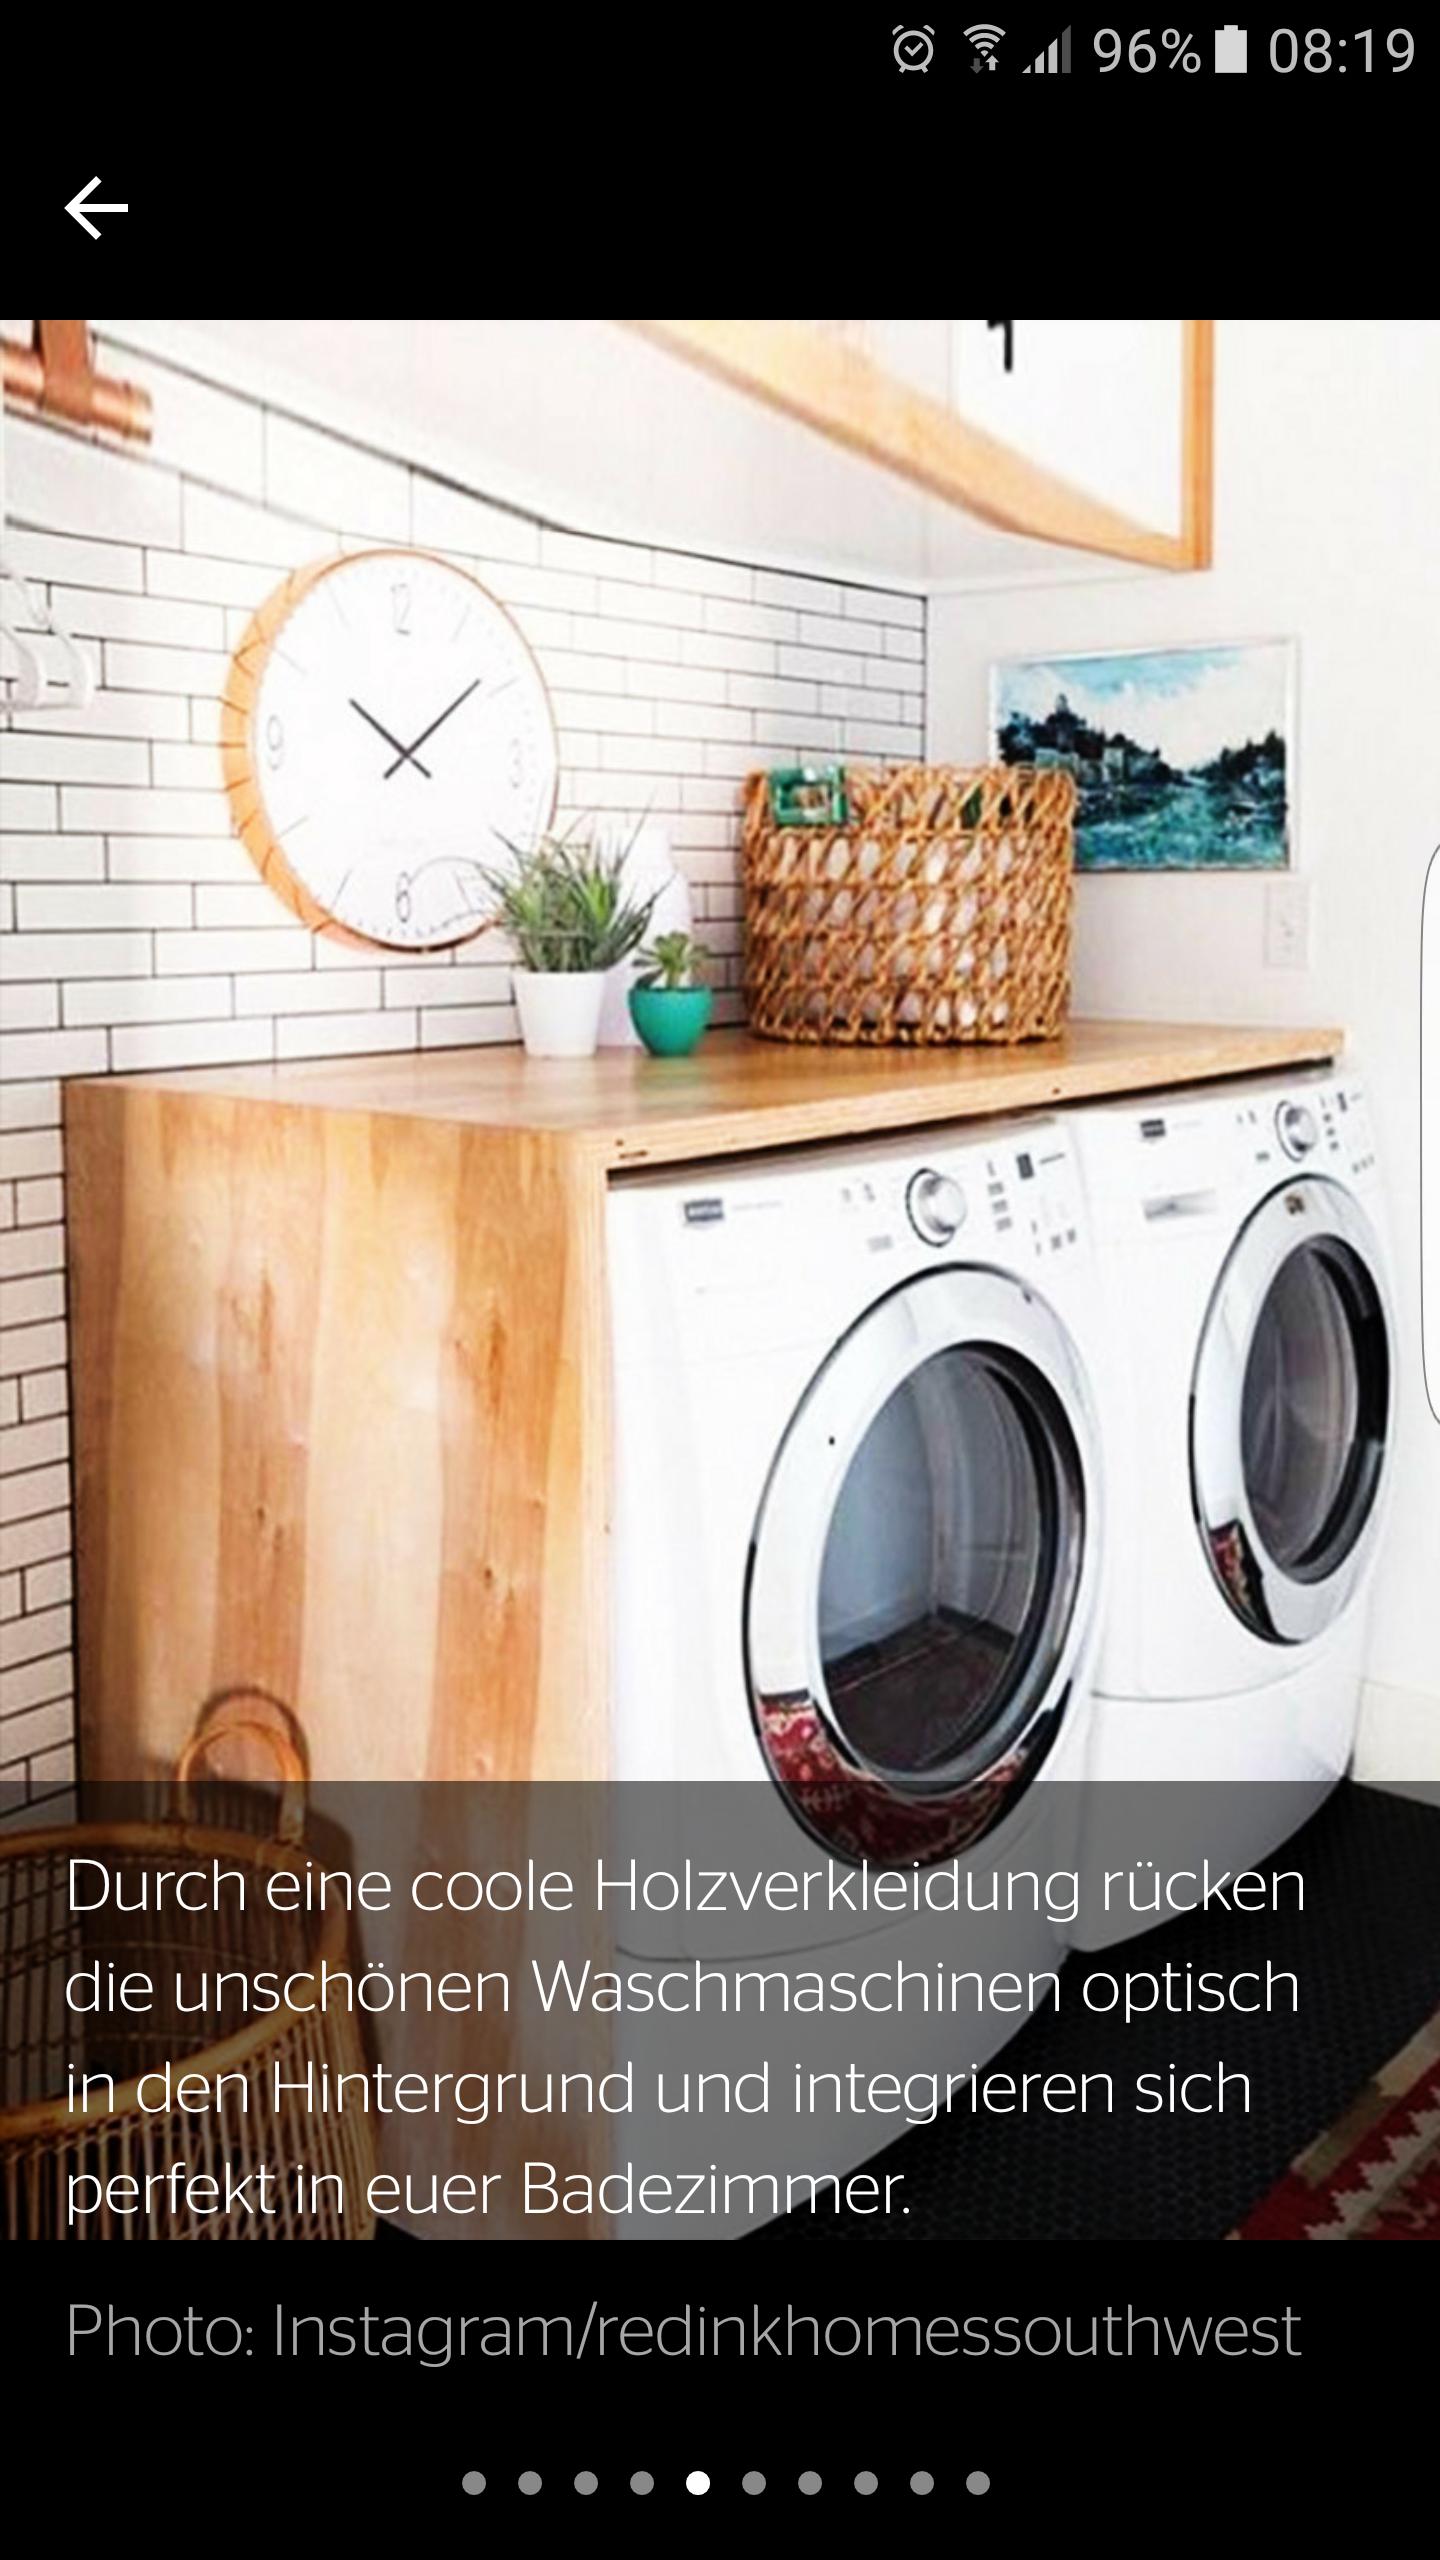 Waschmaschine Trockner Verschonern Trockner Auf Waschmaschine Waschmaschine Wasche